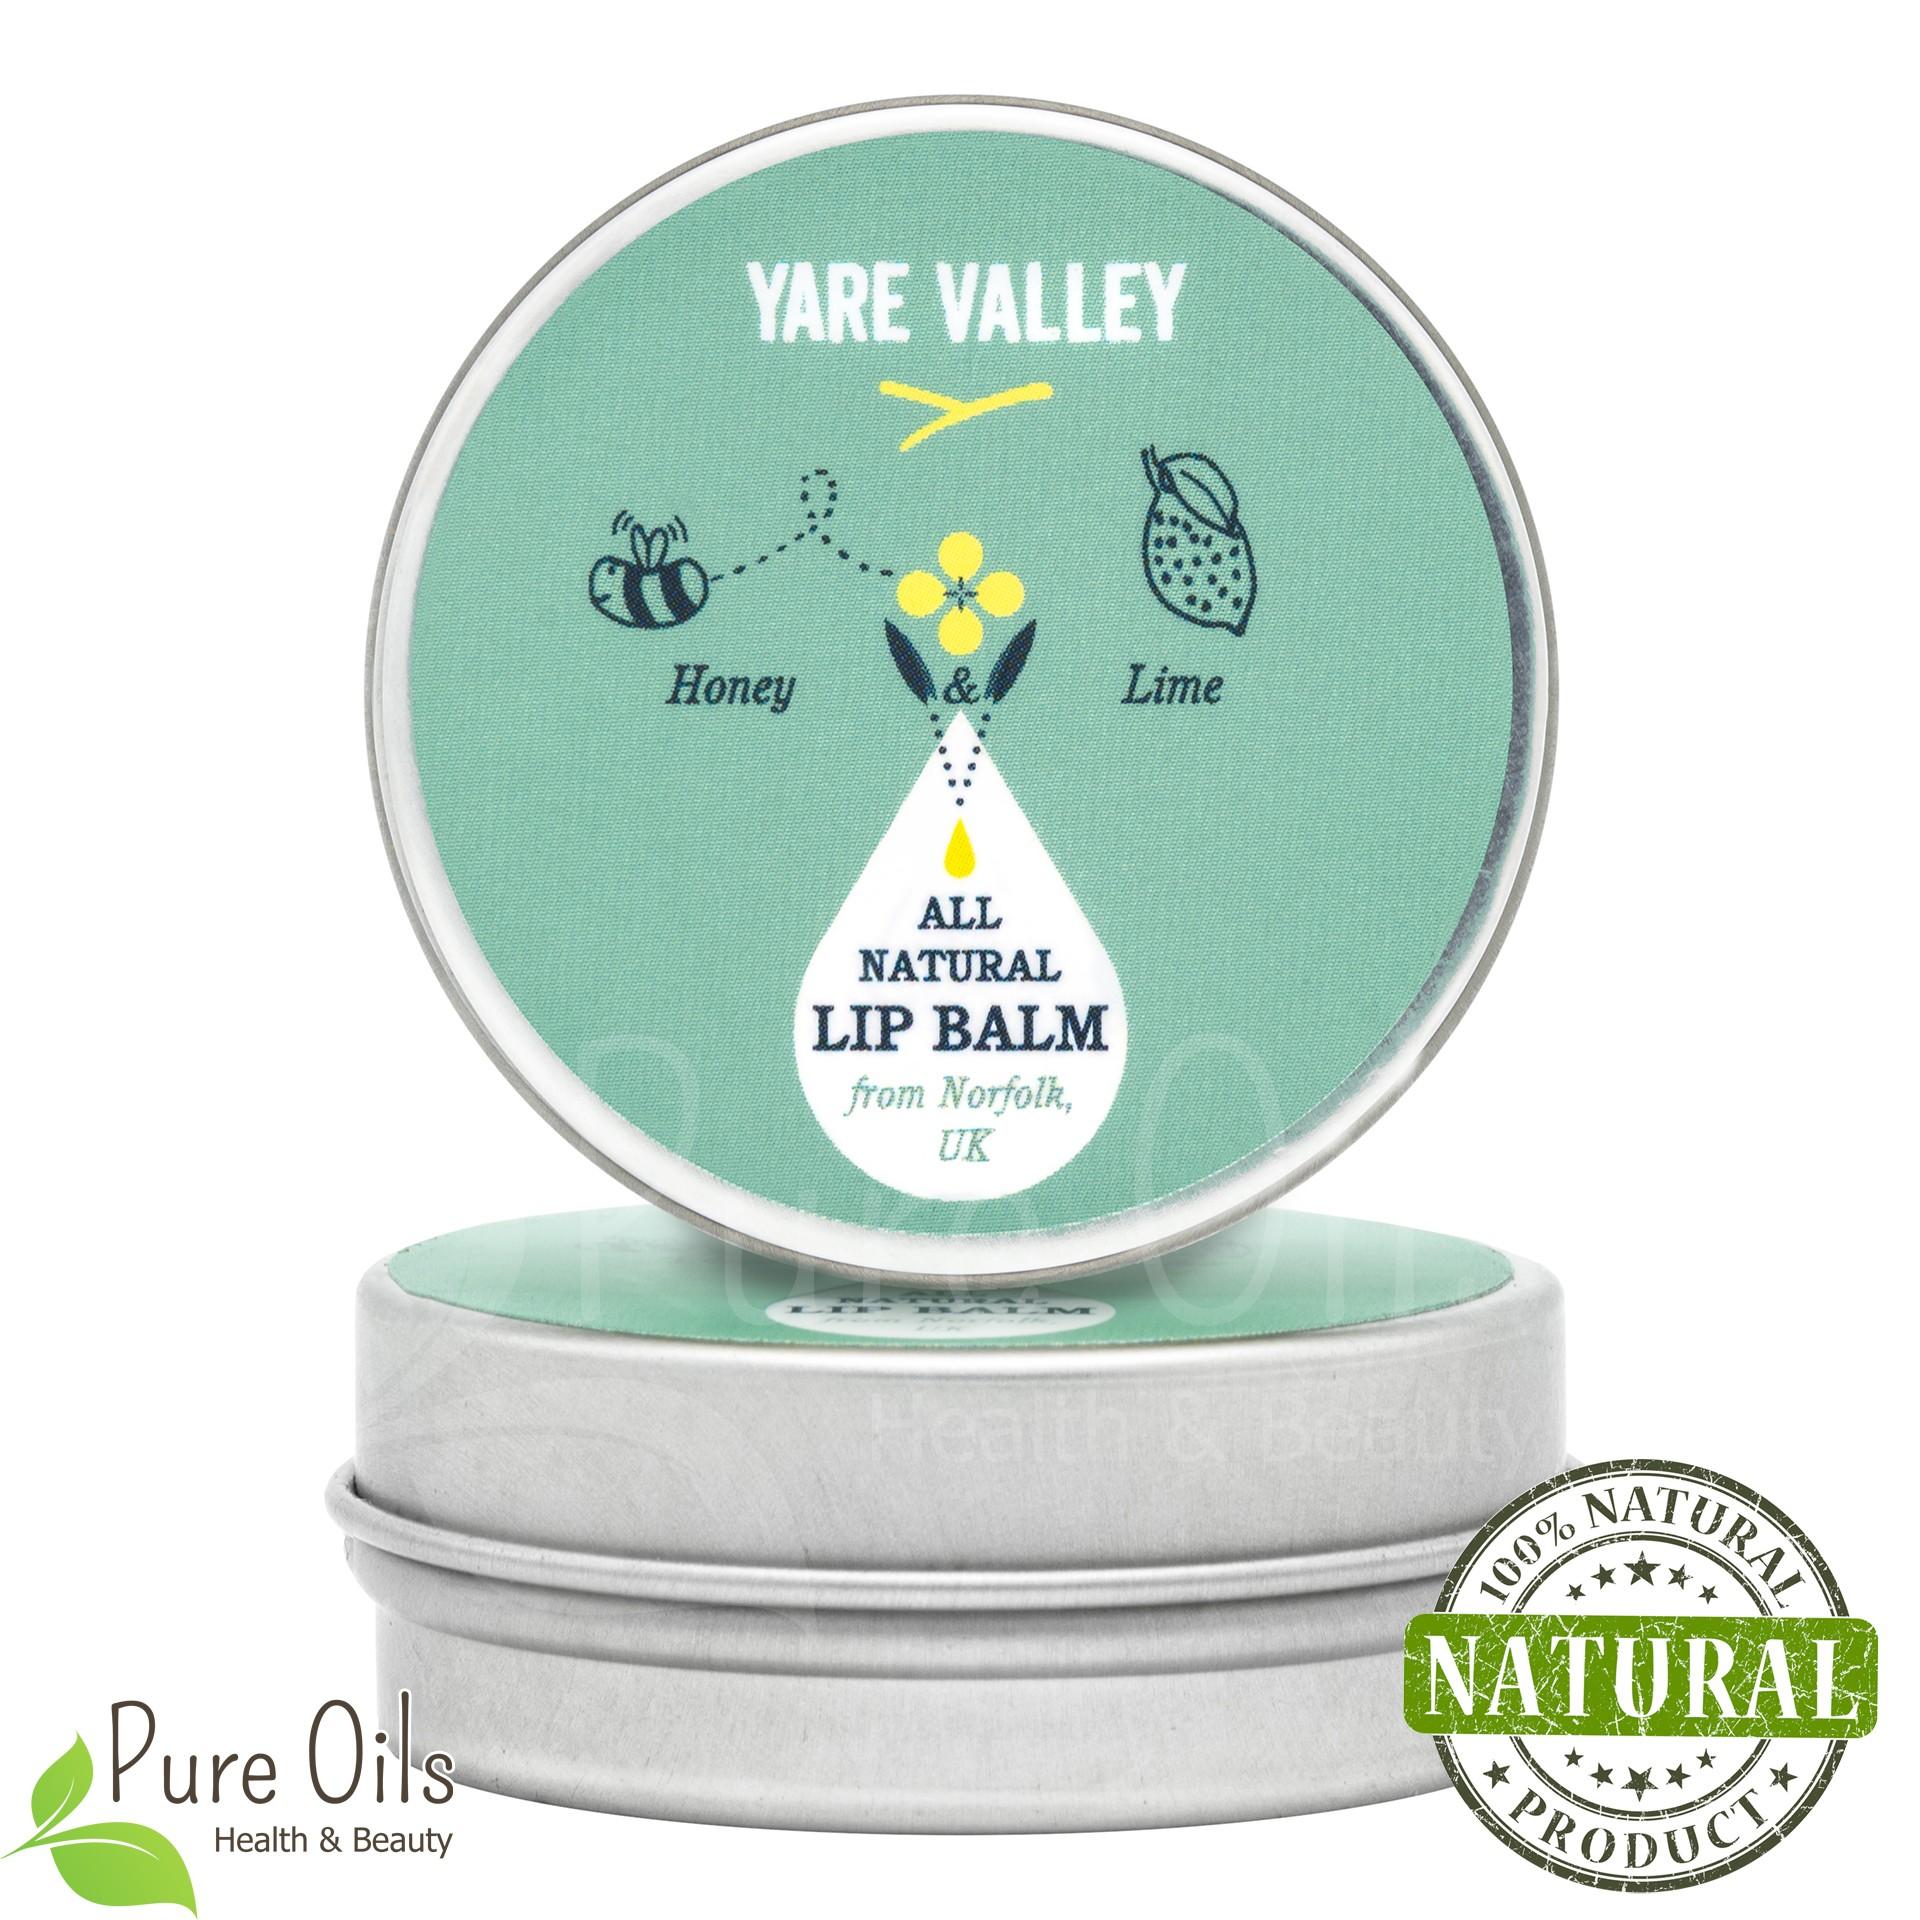 Naturalny Balsam do Ust - Miód i Limonka, Yare Valley